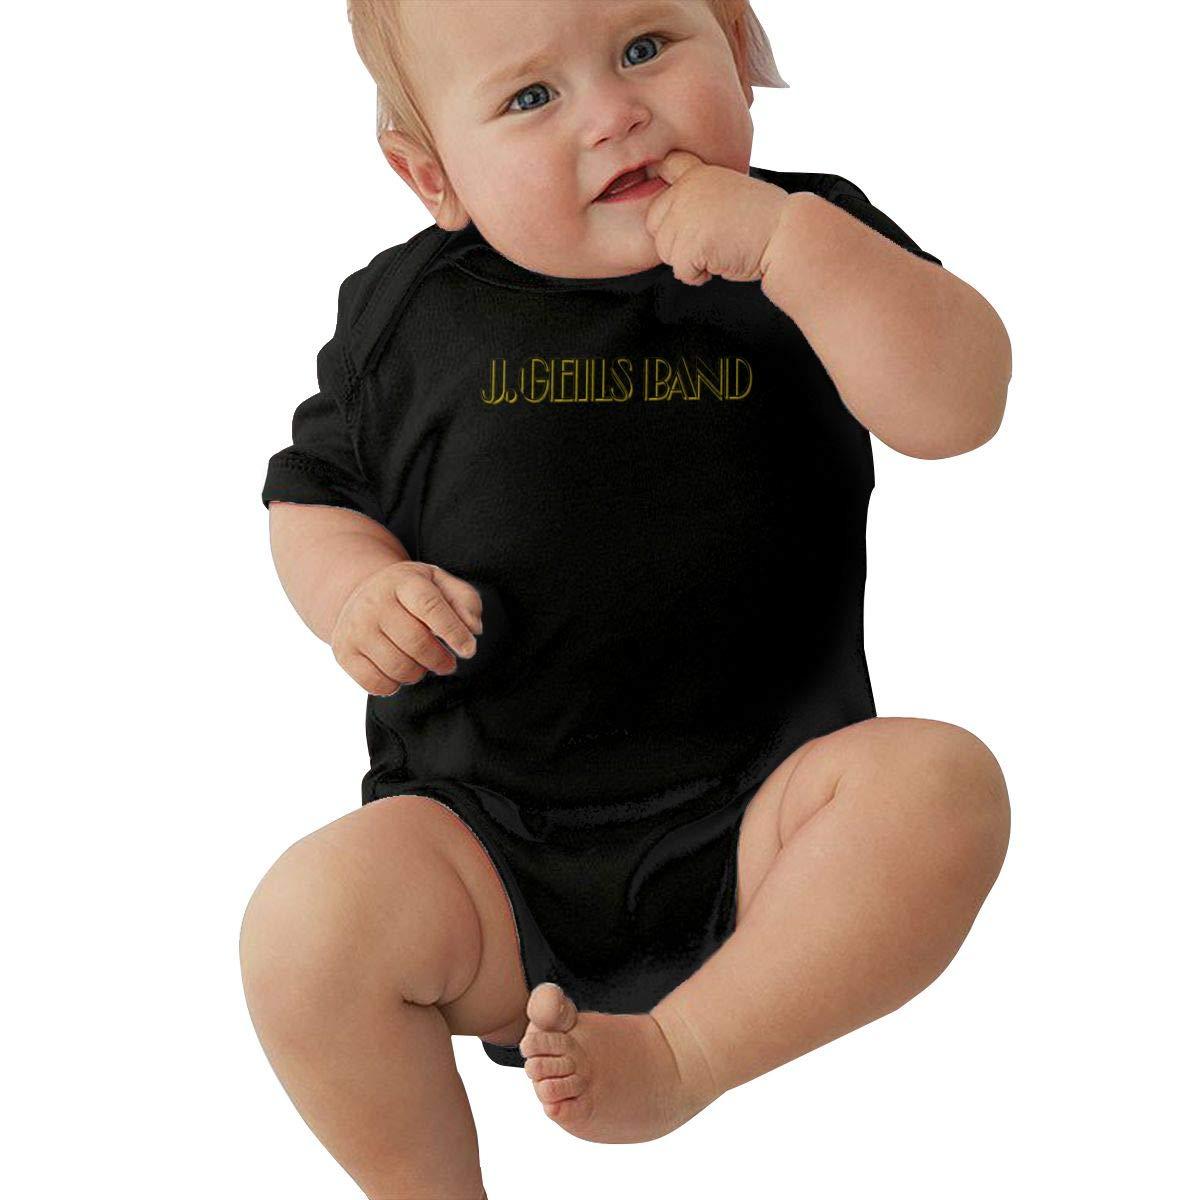 Geils Band Unisex Baby Boys Girls Romper Bodysuit Infant Funny Jumpsuit SusanHuling J